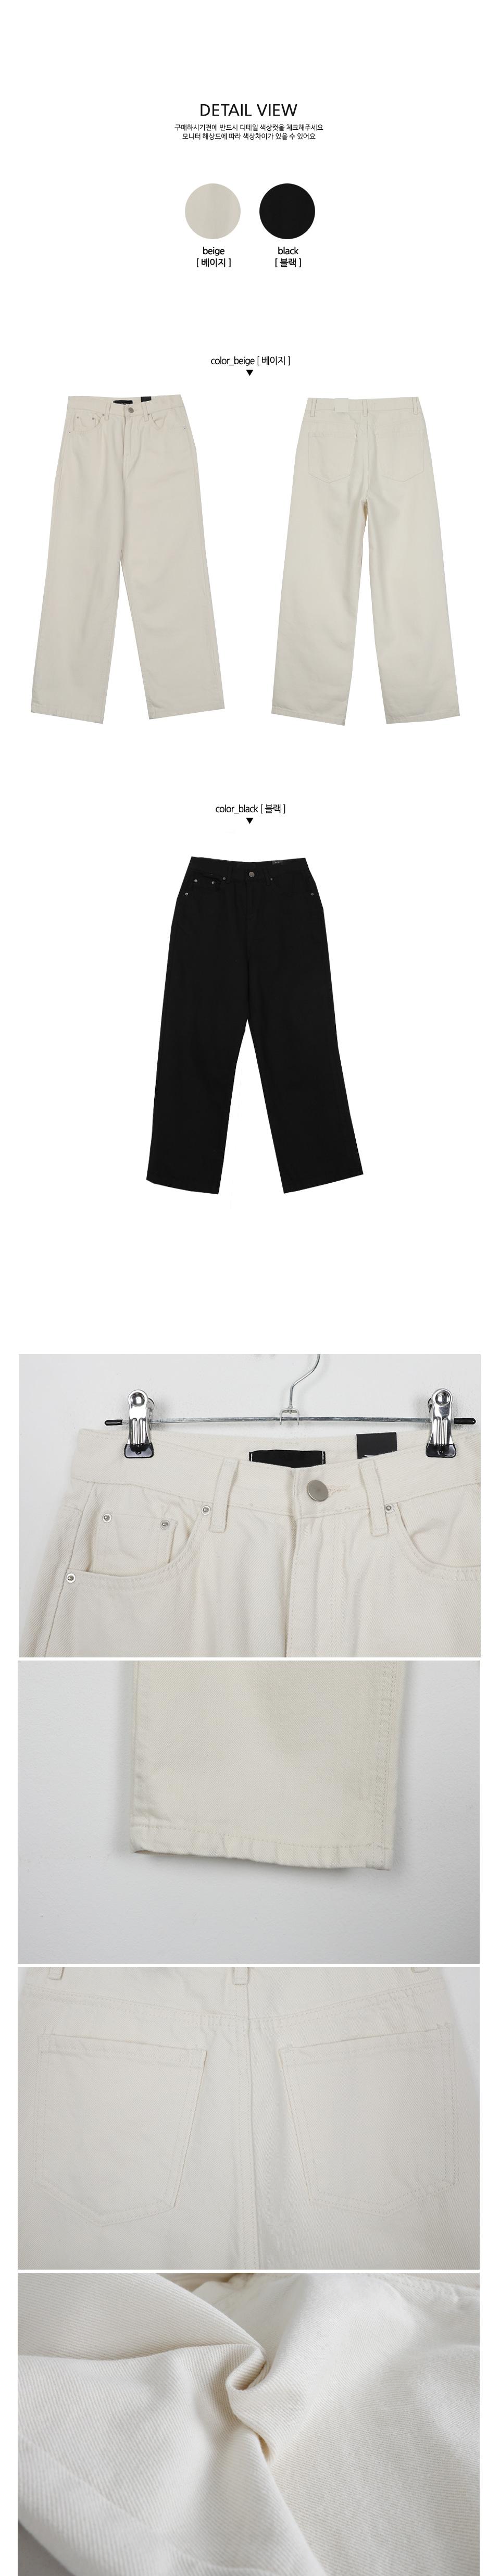 Tani wide pants